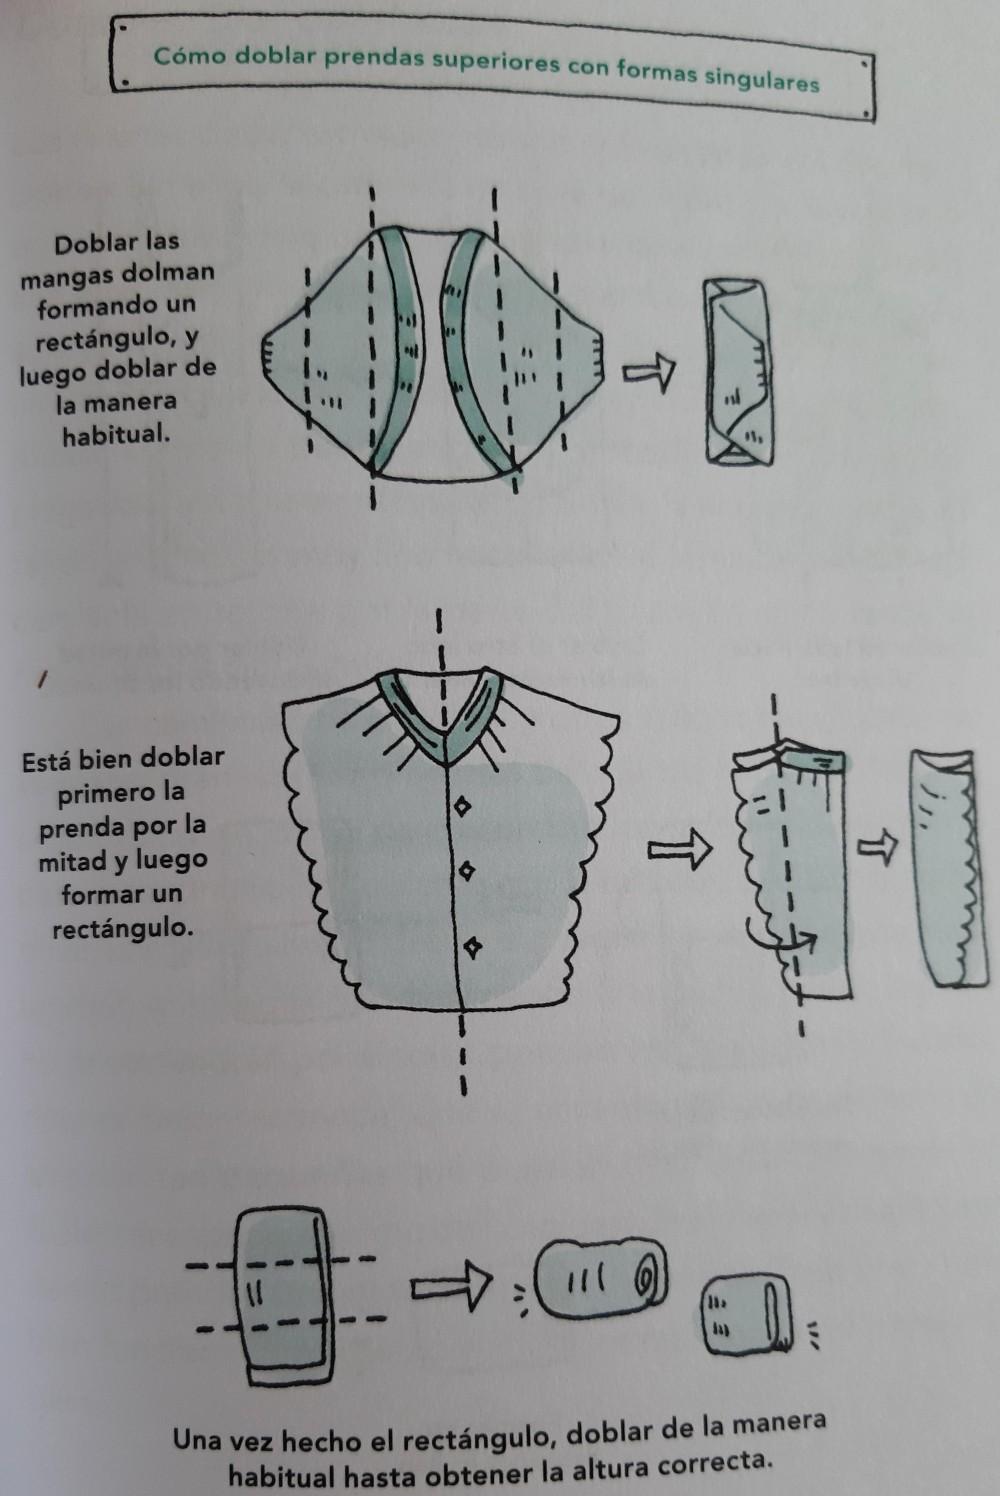 Como doblar prendas formas singulares_2